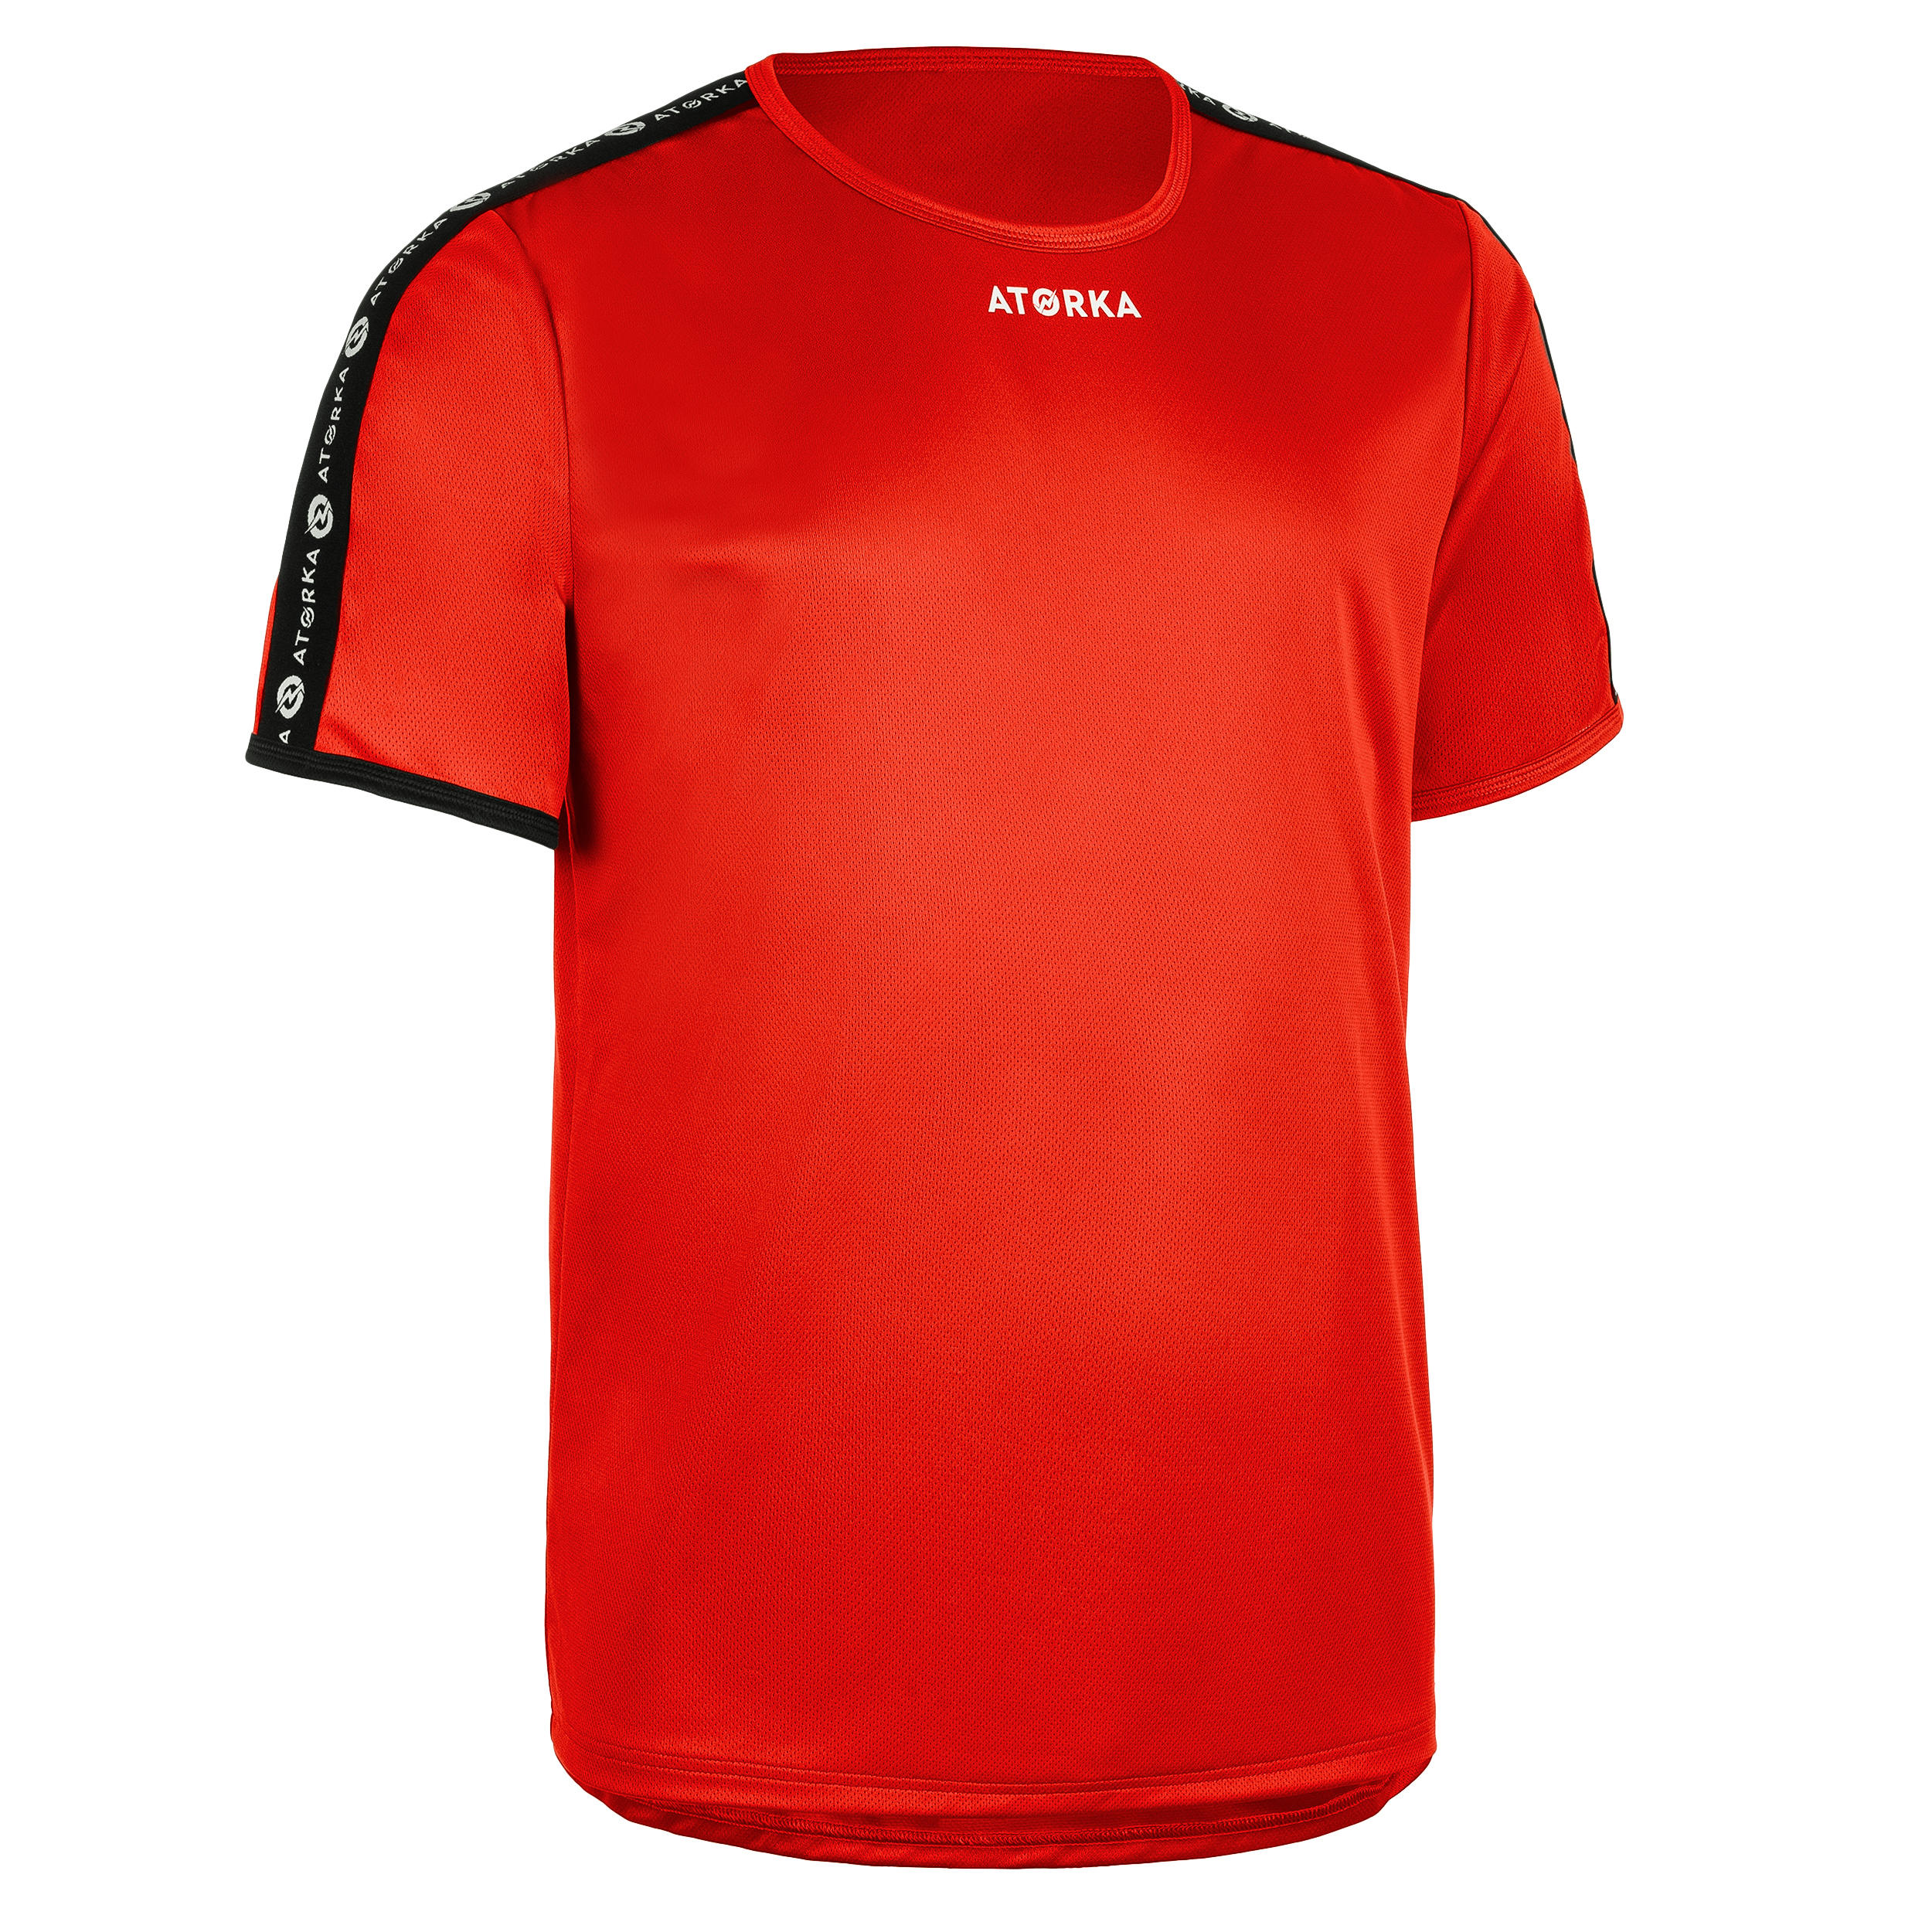 Tricou H100C roșu bărbați la Reducere poza